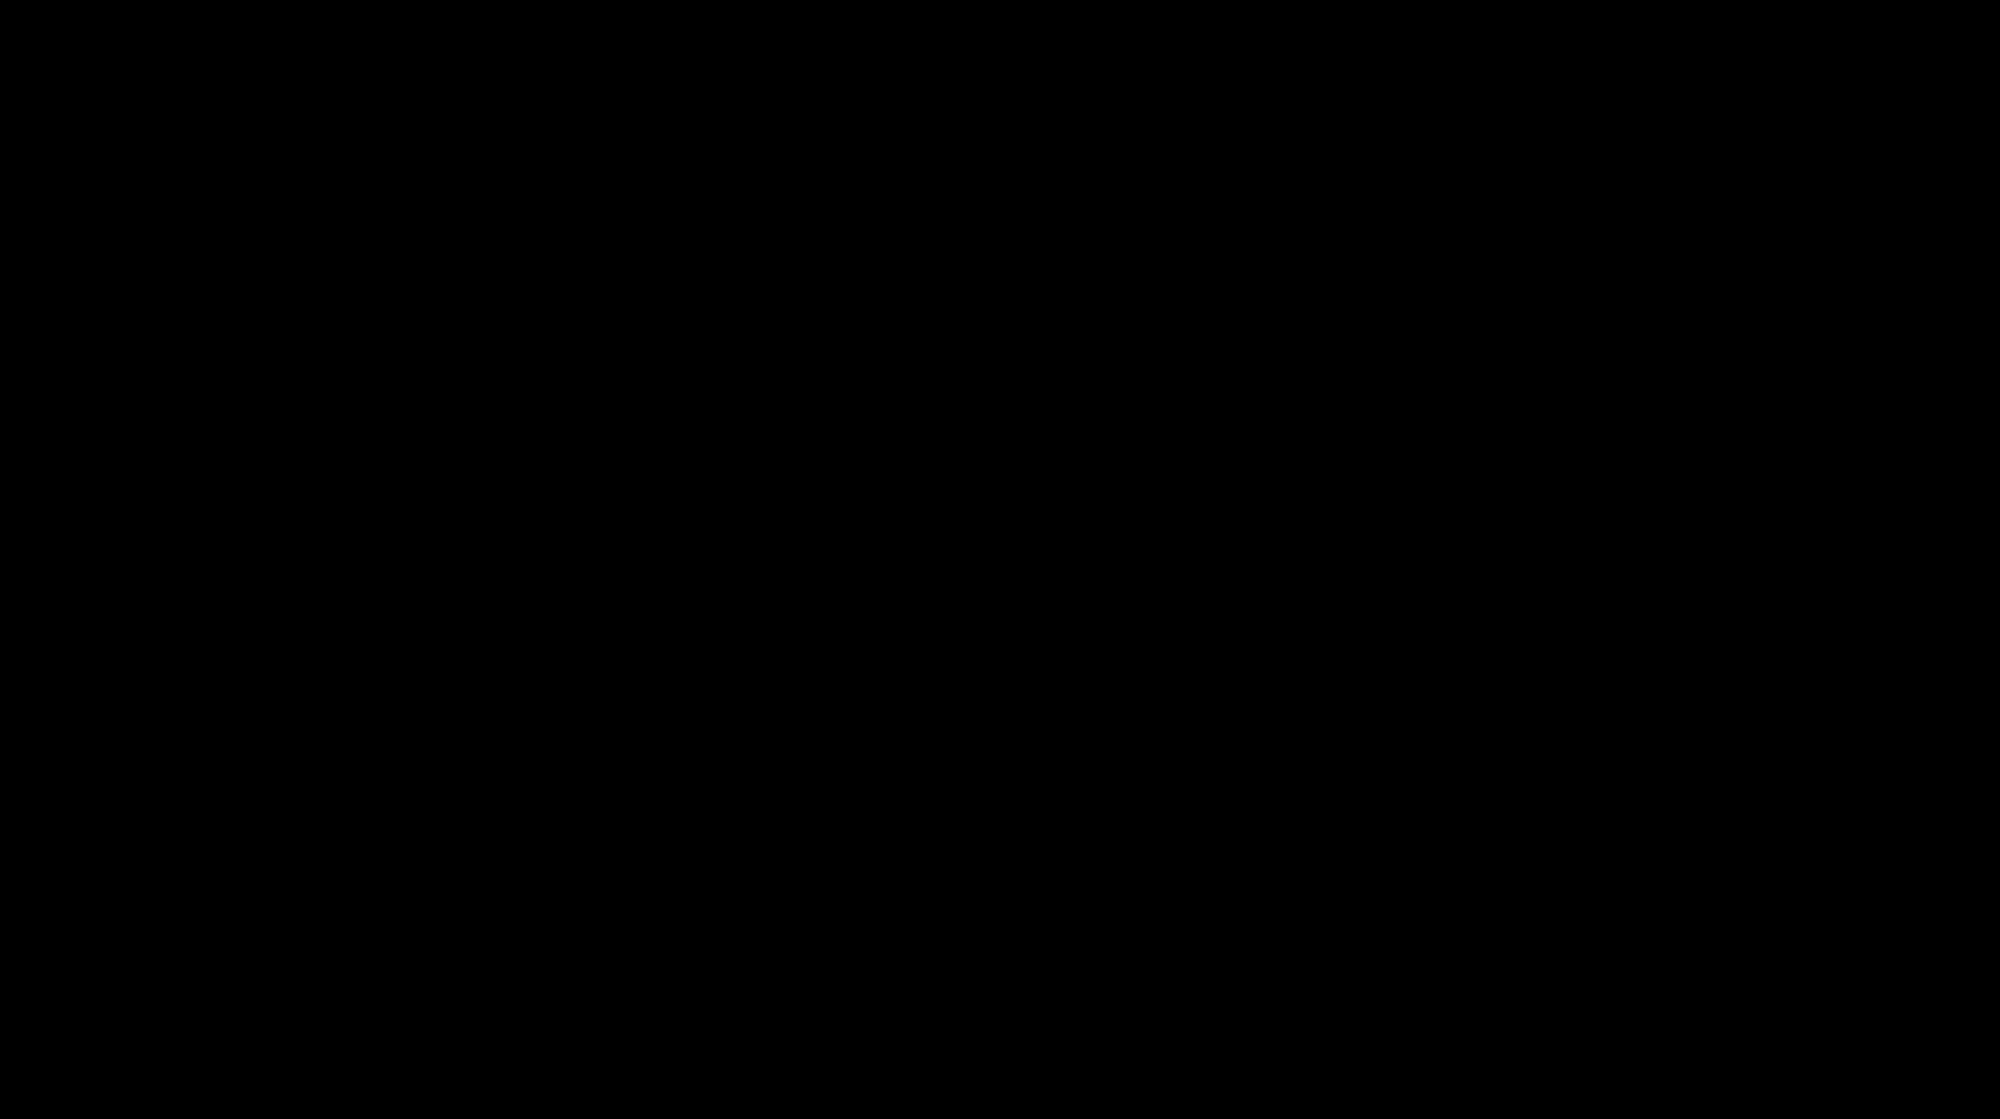 2000x1119 Filered Billed Gull In Flight Silhouette.svg